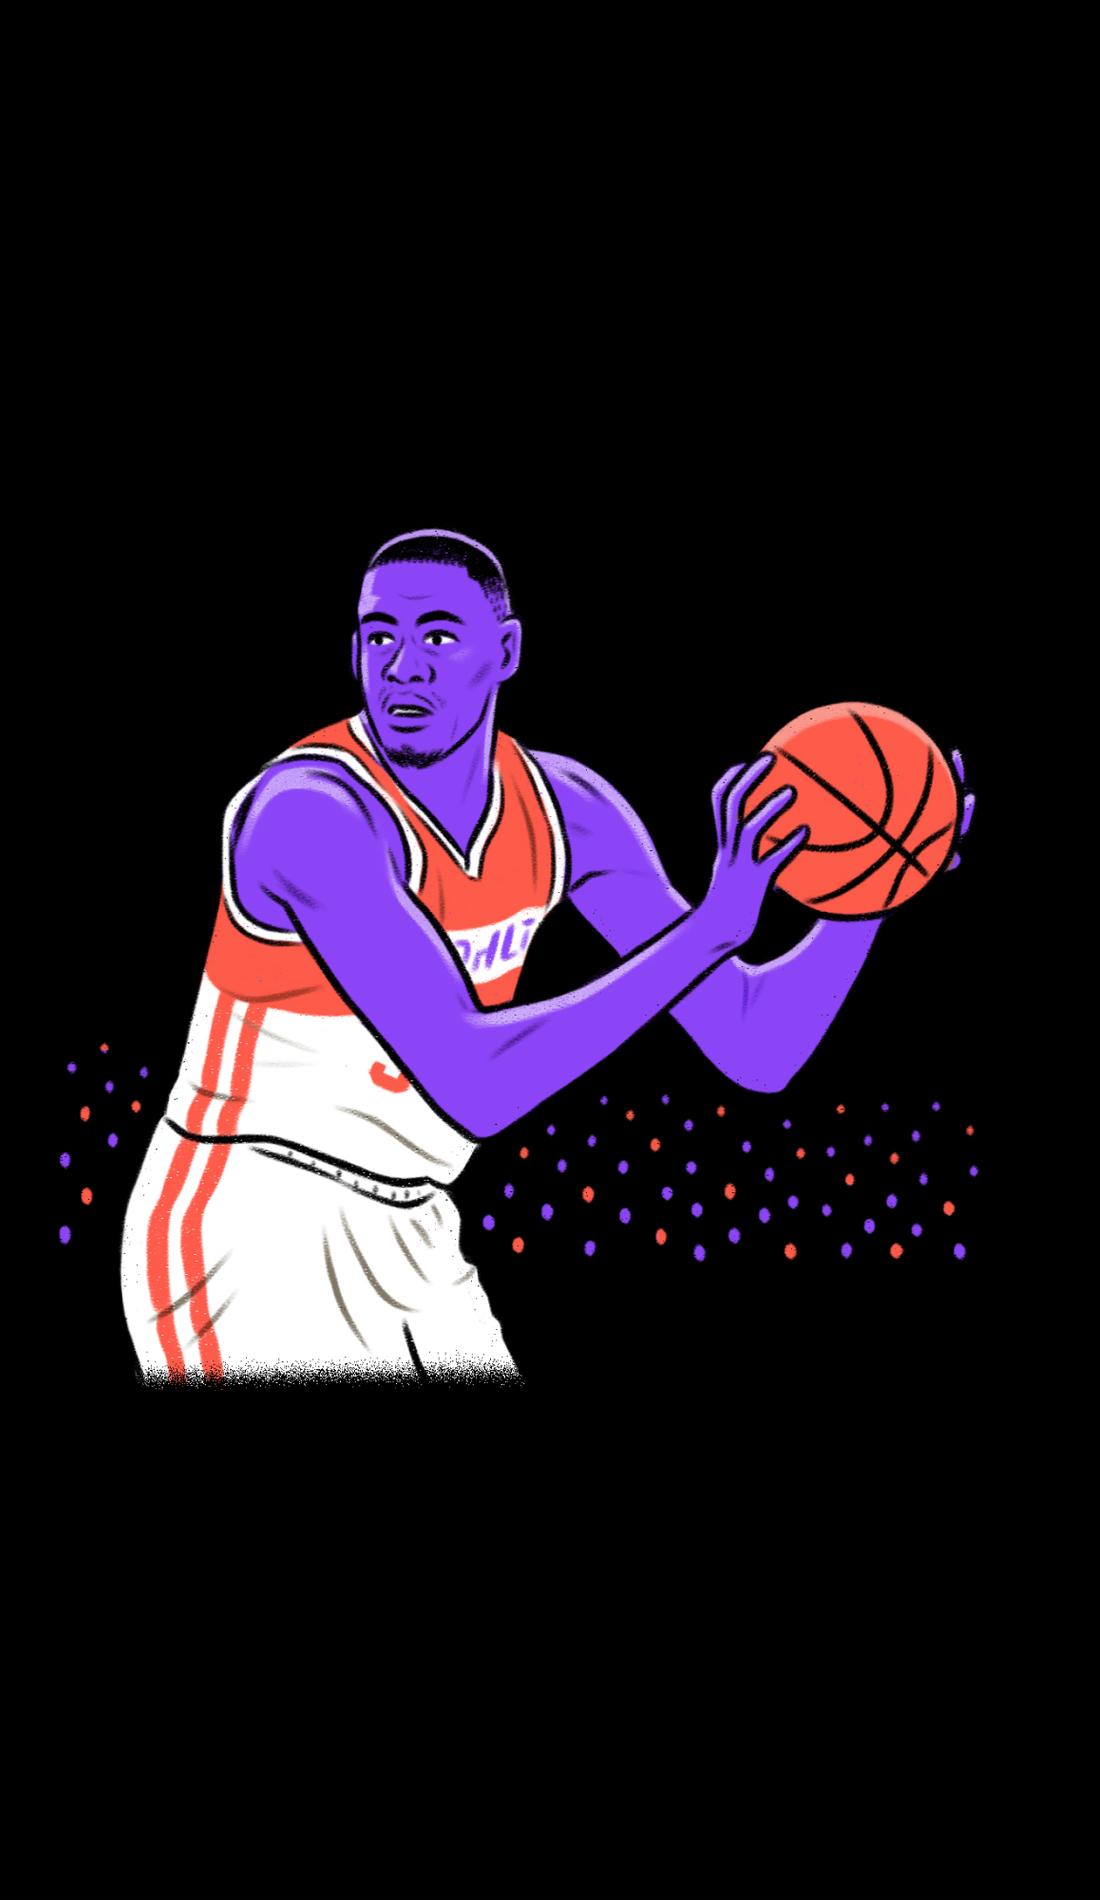 A Wyoming Cowboys Basketball live event